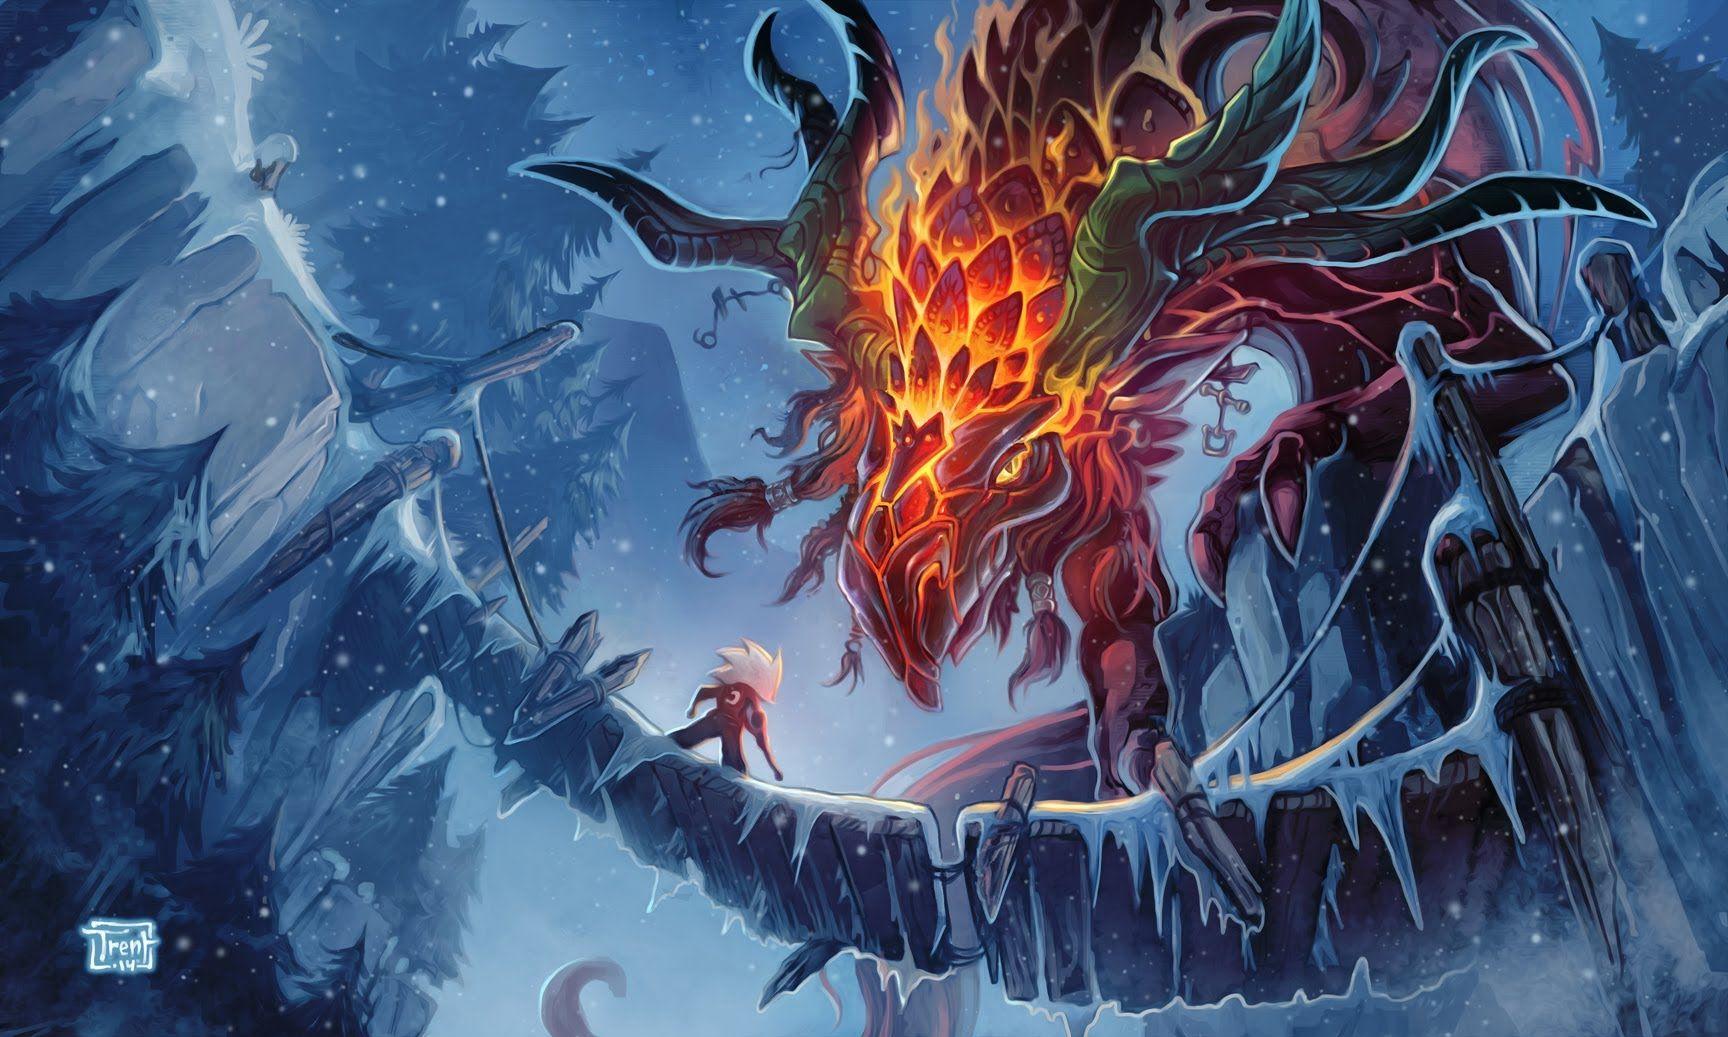 Glass Dragon by Trent Kaniuga